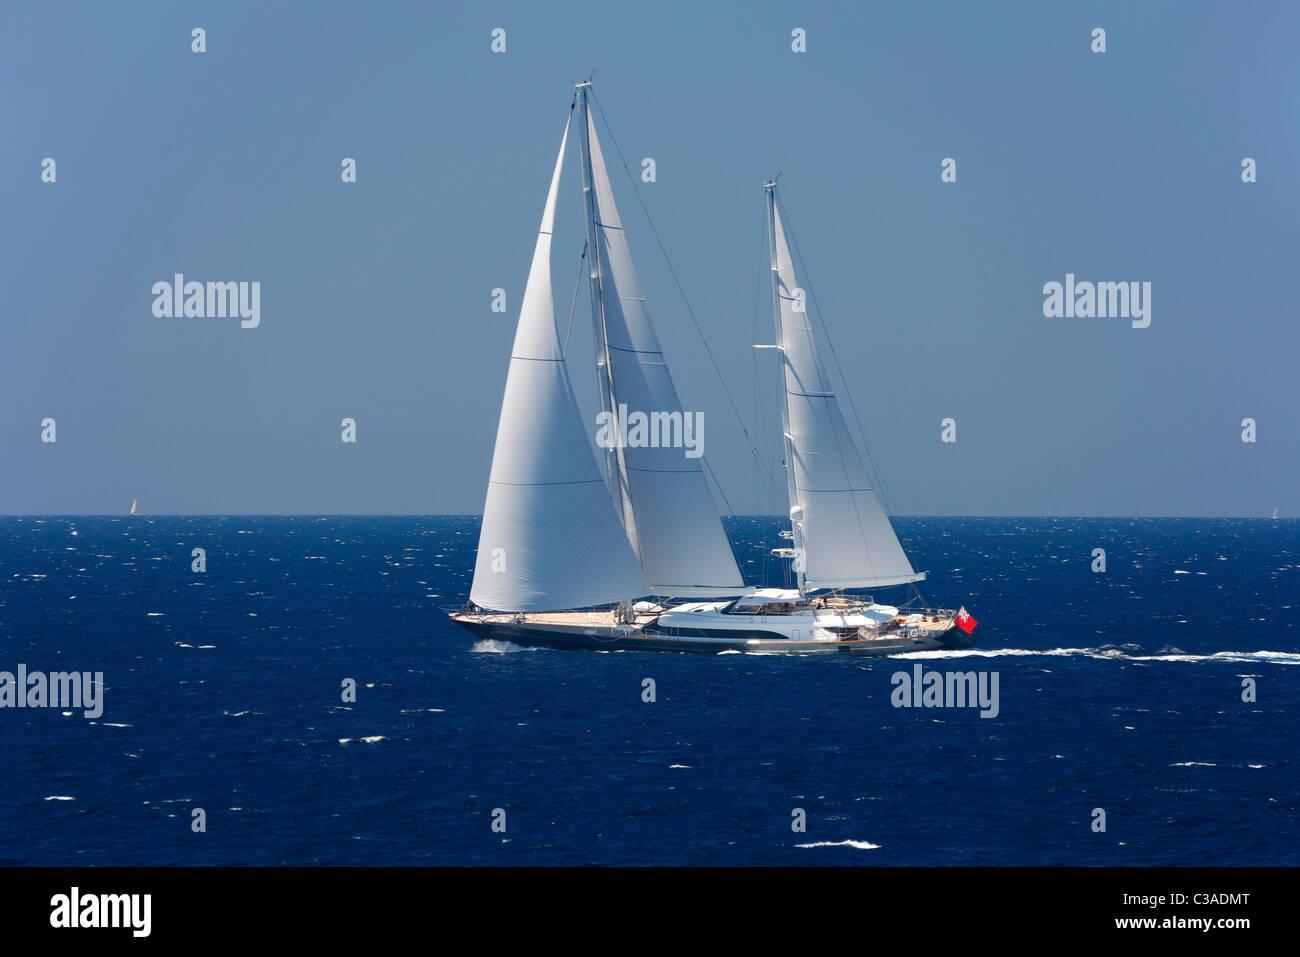 Sailboat sail in Mediterranean - Stock Image